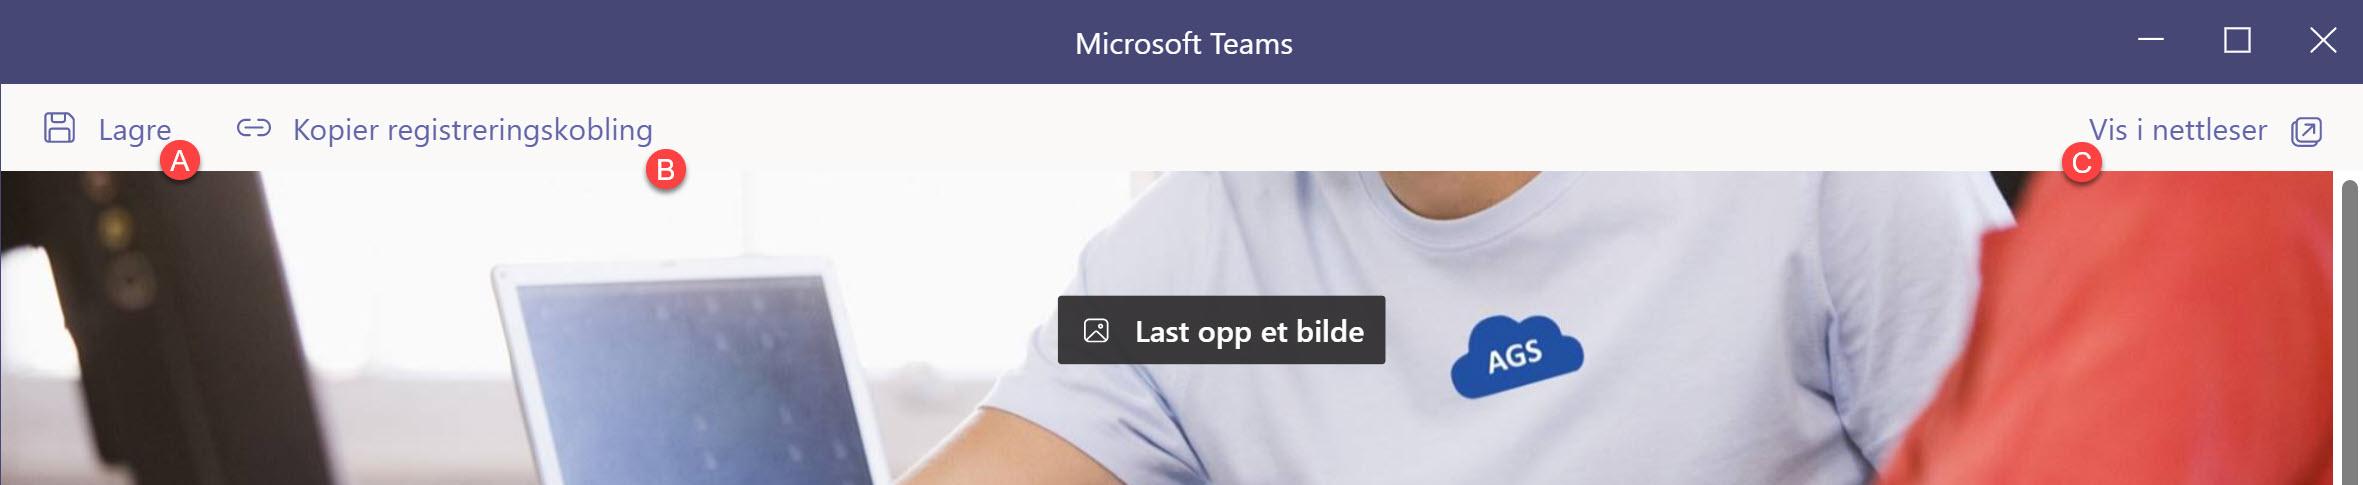 Hvordan lage webinar i Microsoft Teams 16